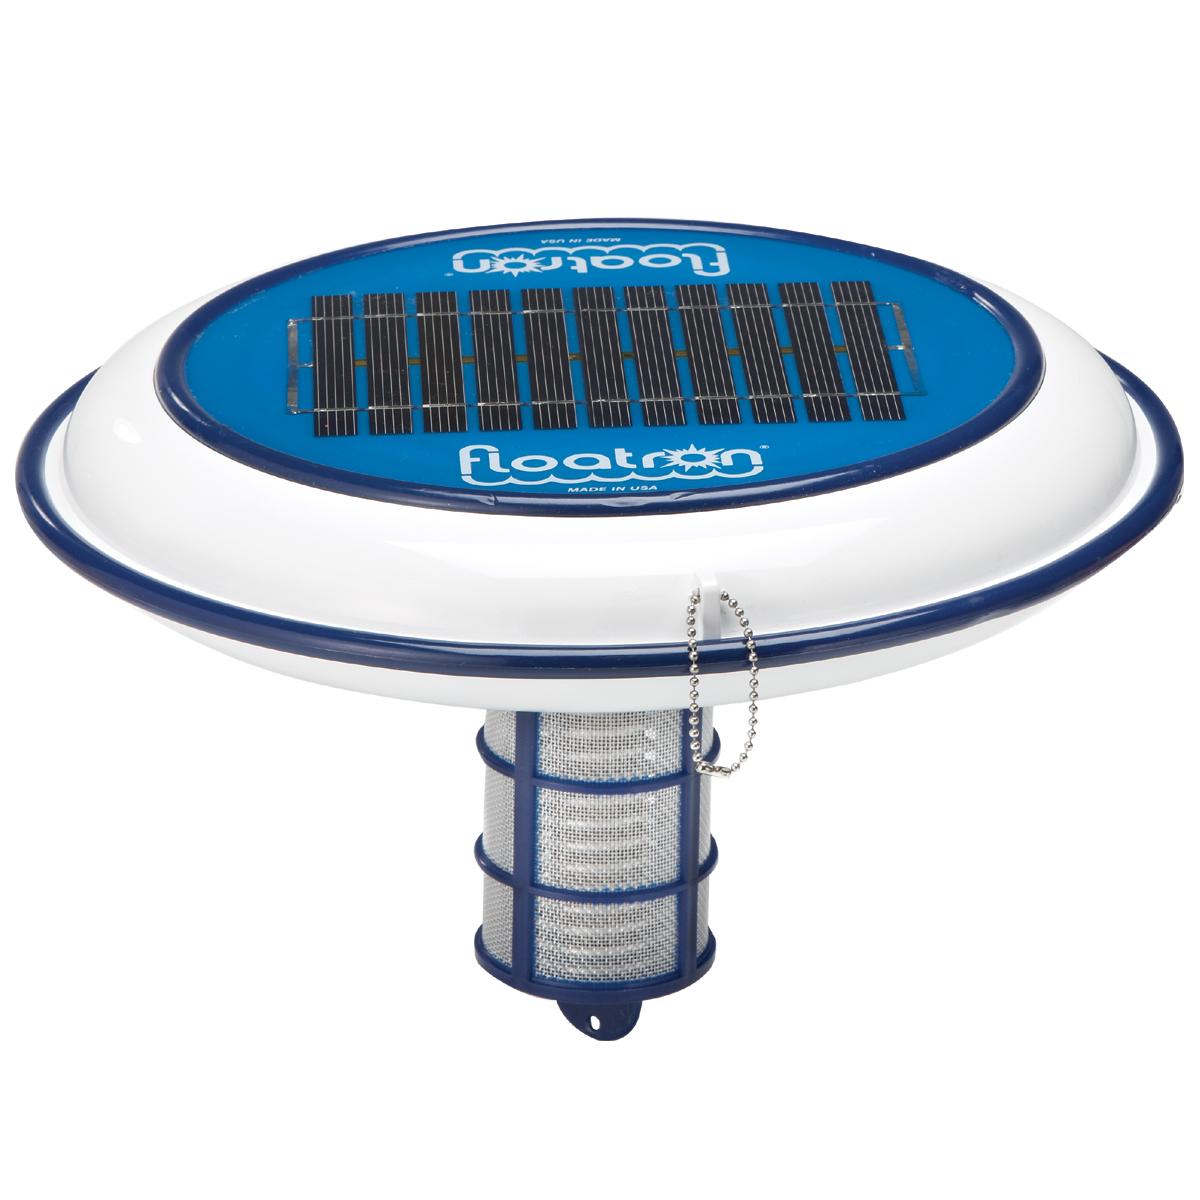 Floatron Water Ioniser